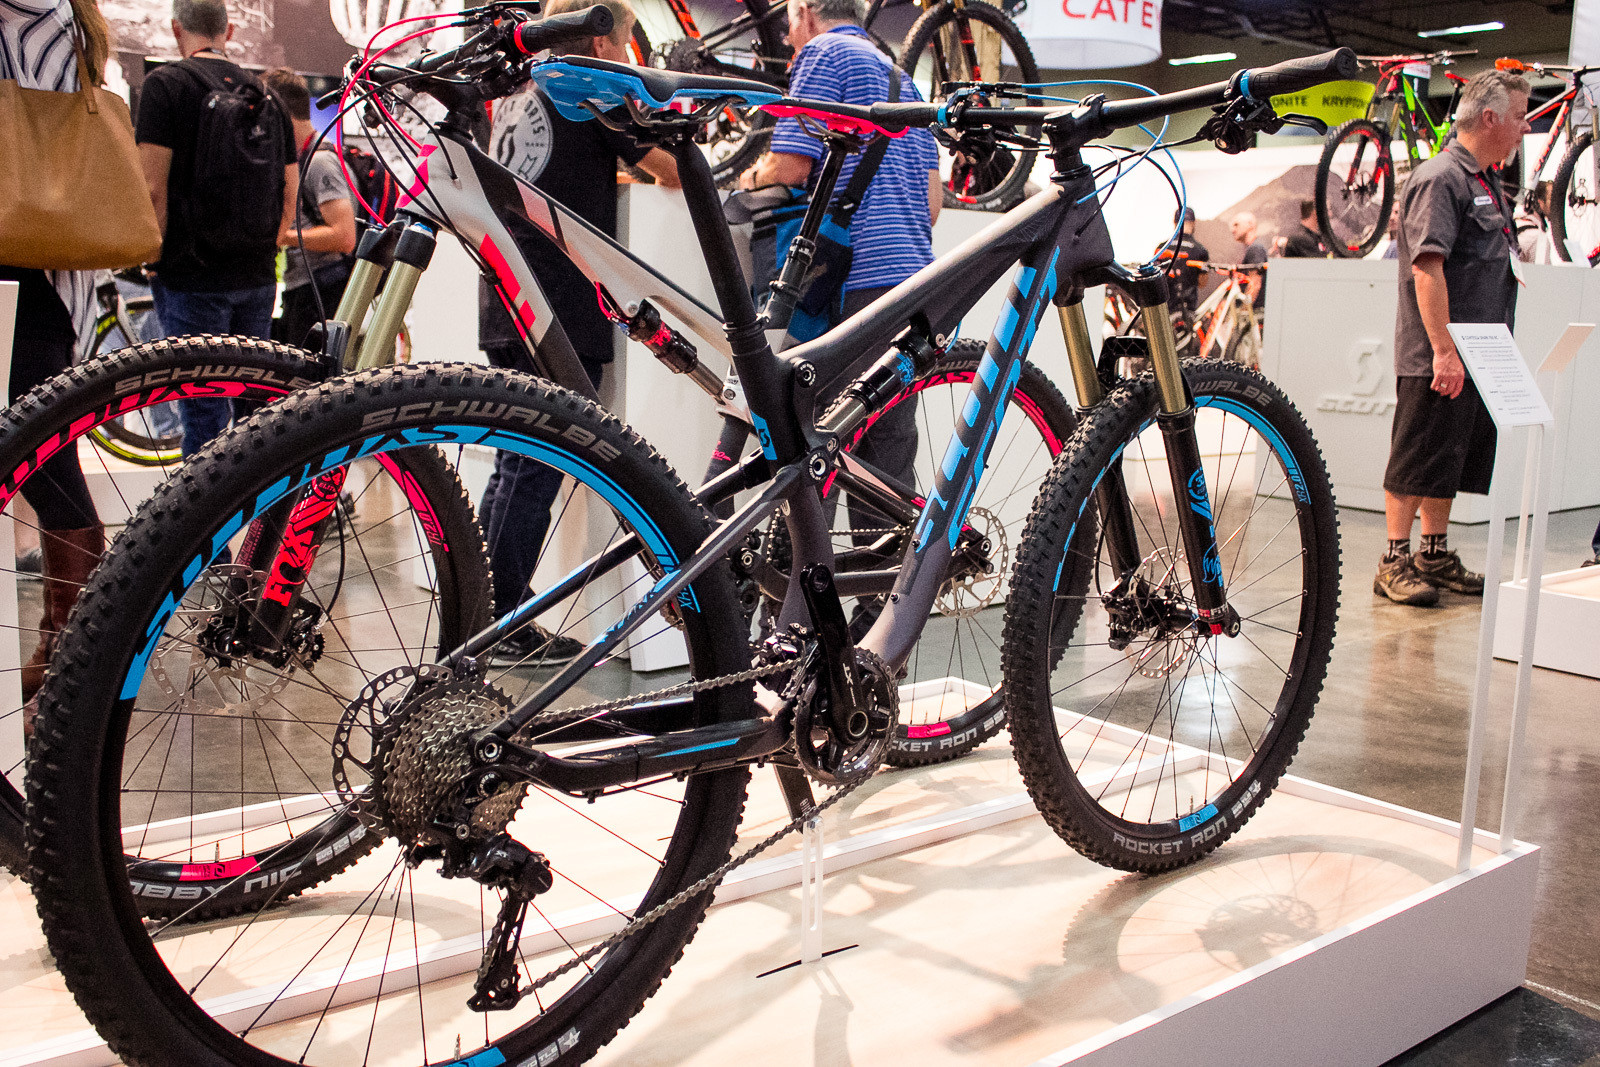 2016 Scott Contessa Women's Bikes - 2016 Women's Bikes and Gear at Interbike - Mountain Biking Pictures - Vital MTB